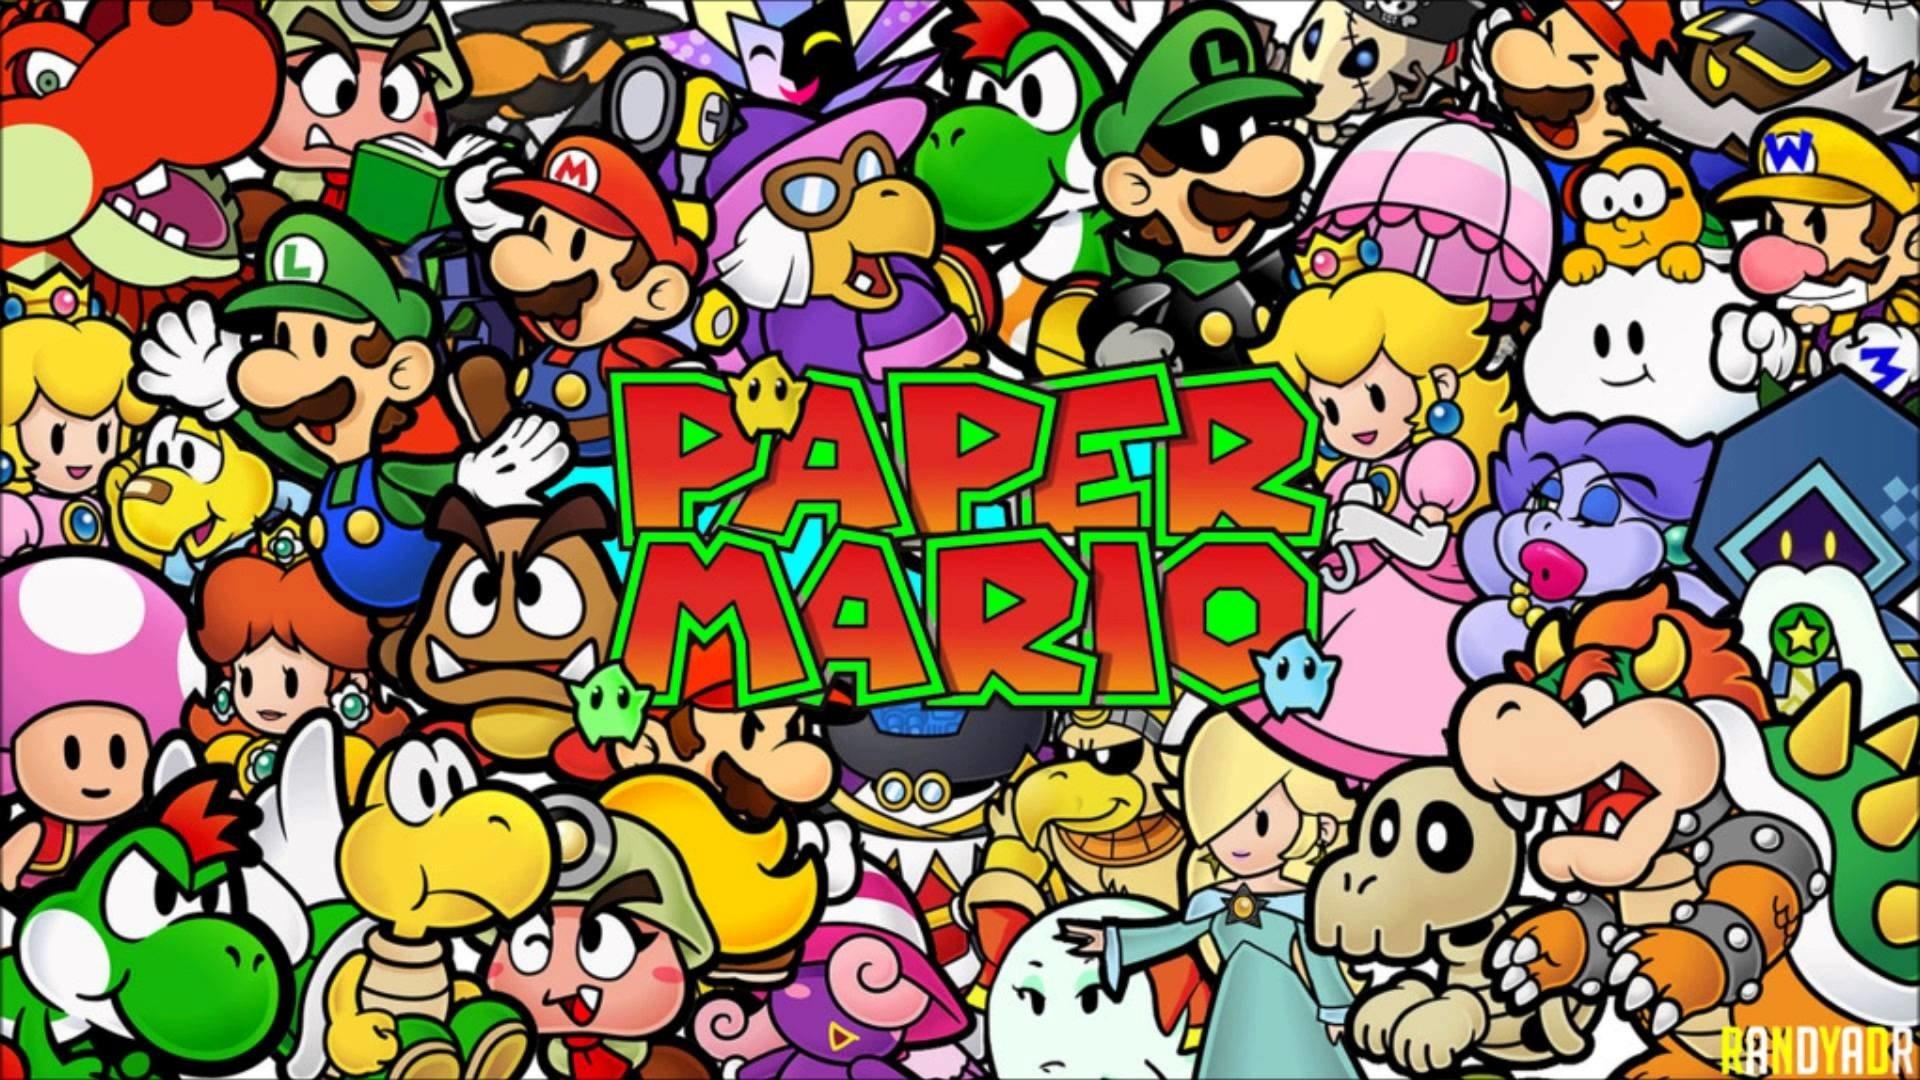 Paper Mario Hd Wallpaper Background Image 1920x1080 Id 821496